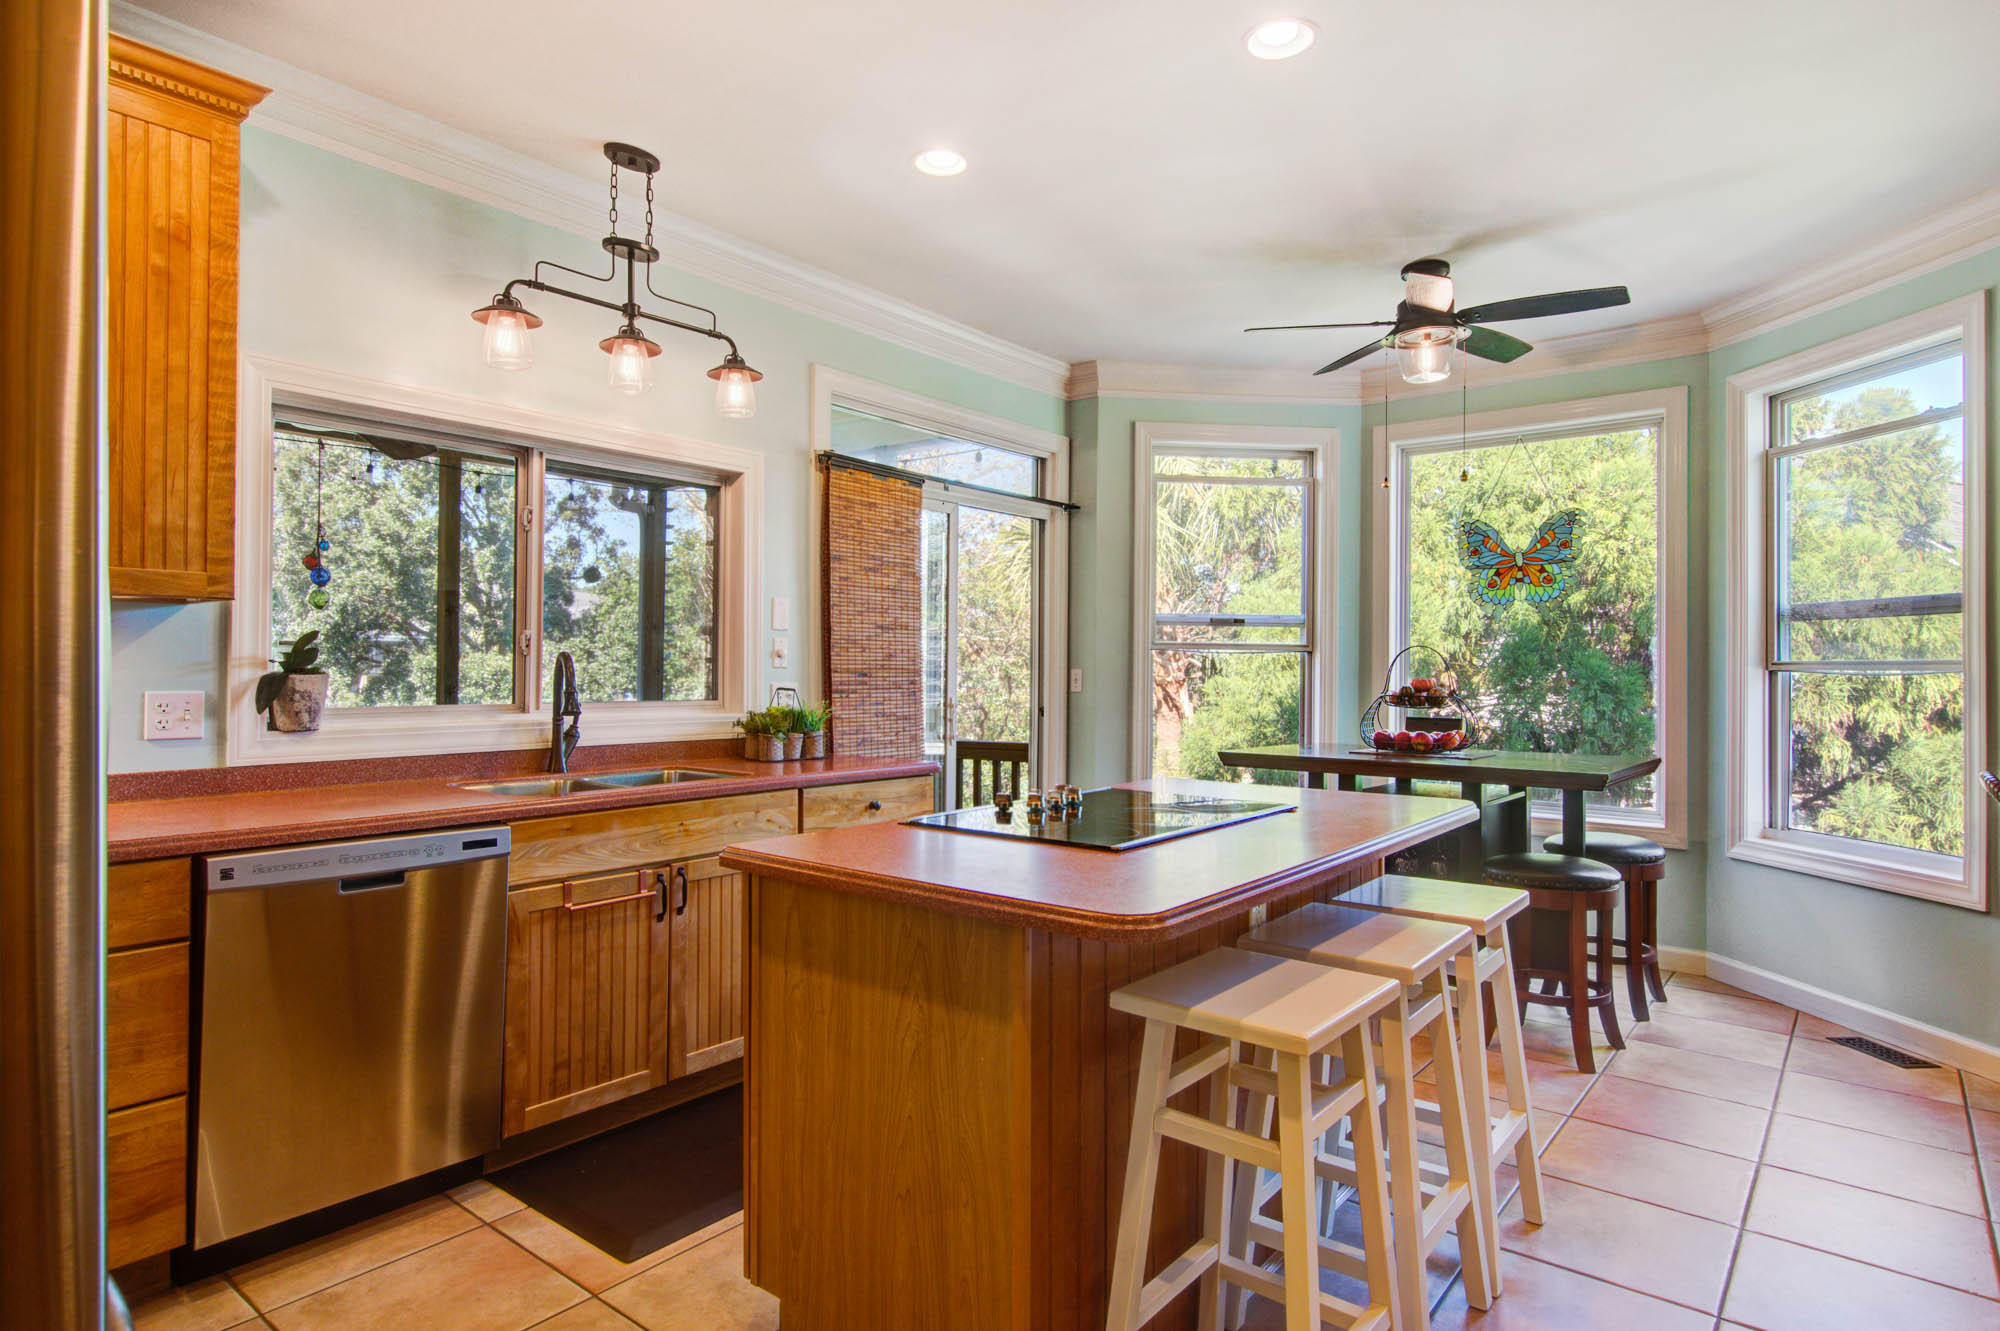 St Thomas Point Homes For Sale - 307 Jamesbury, Charleston, SC - 32